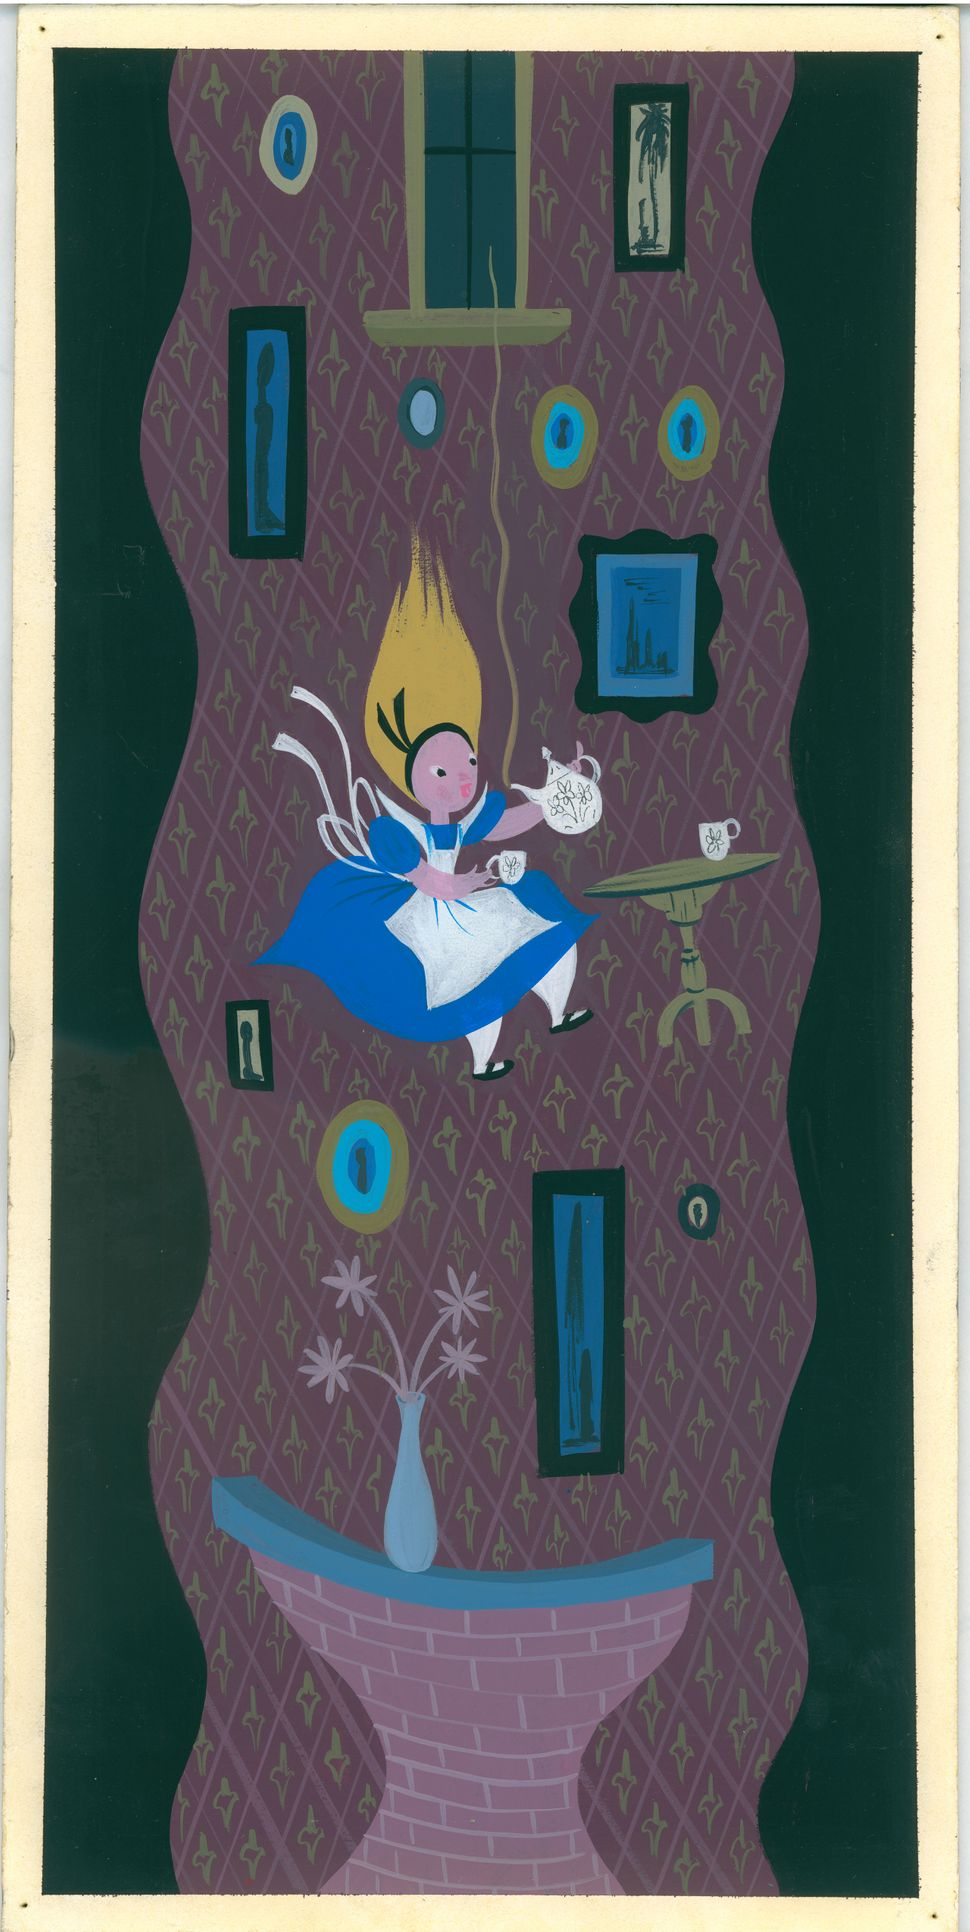 Mary Blair, Alice falling down the rabbit hole, 1951, gouache; 17 x 8.5 in. (43.18 cm x 21.59 cm); Walt Disney Family Foundat